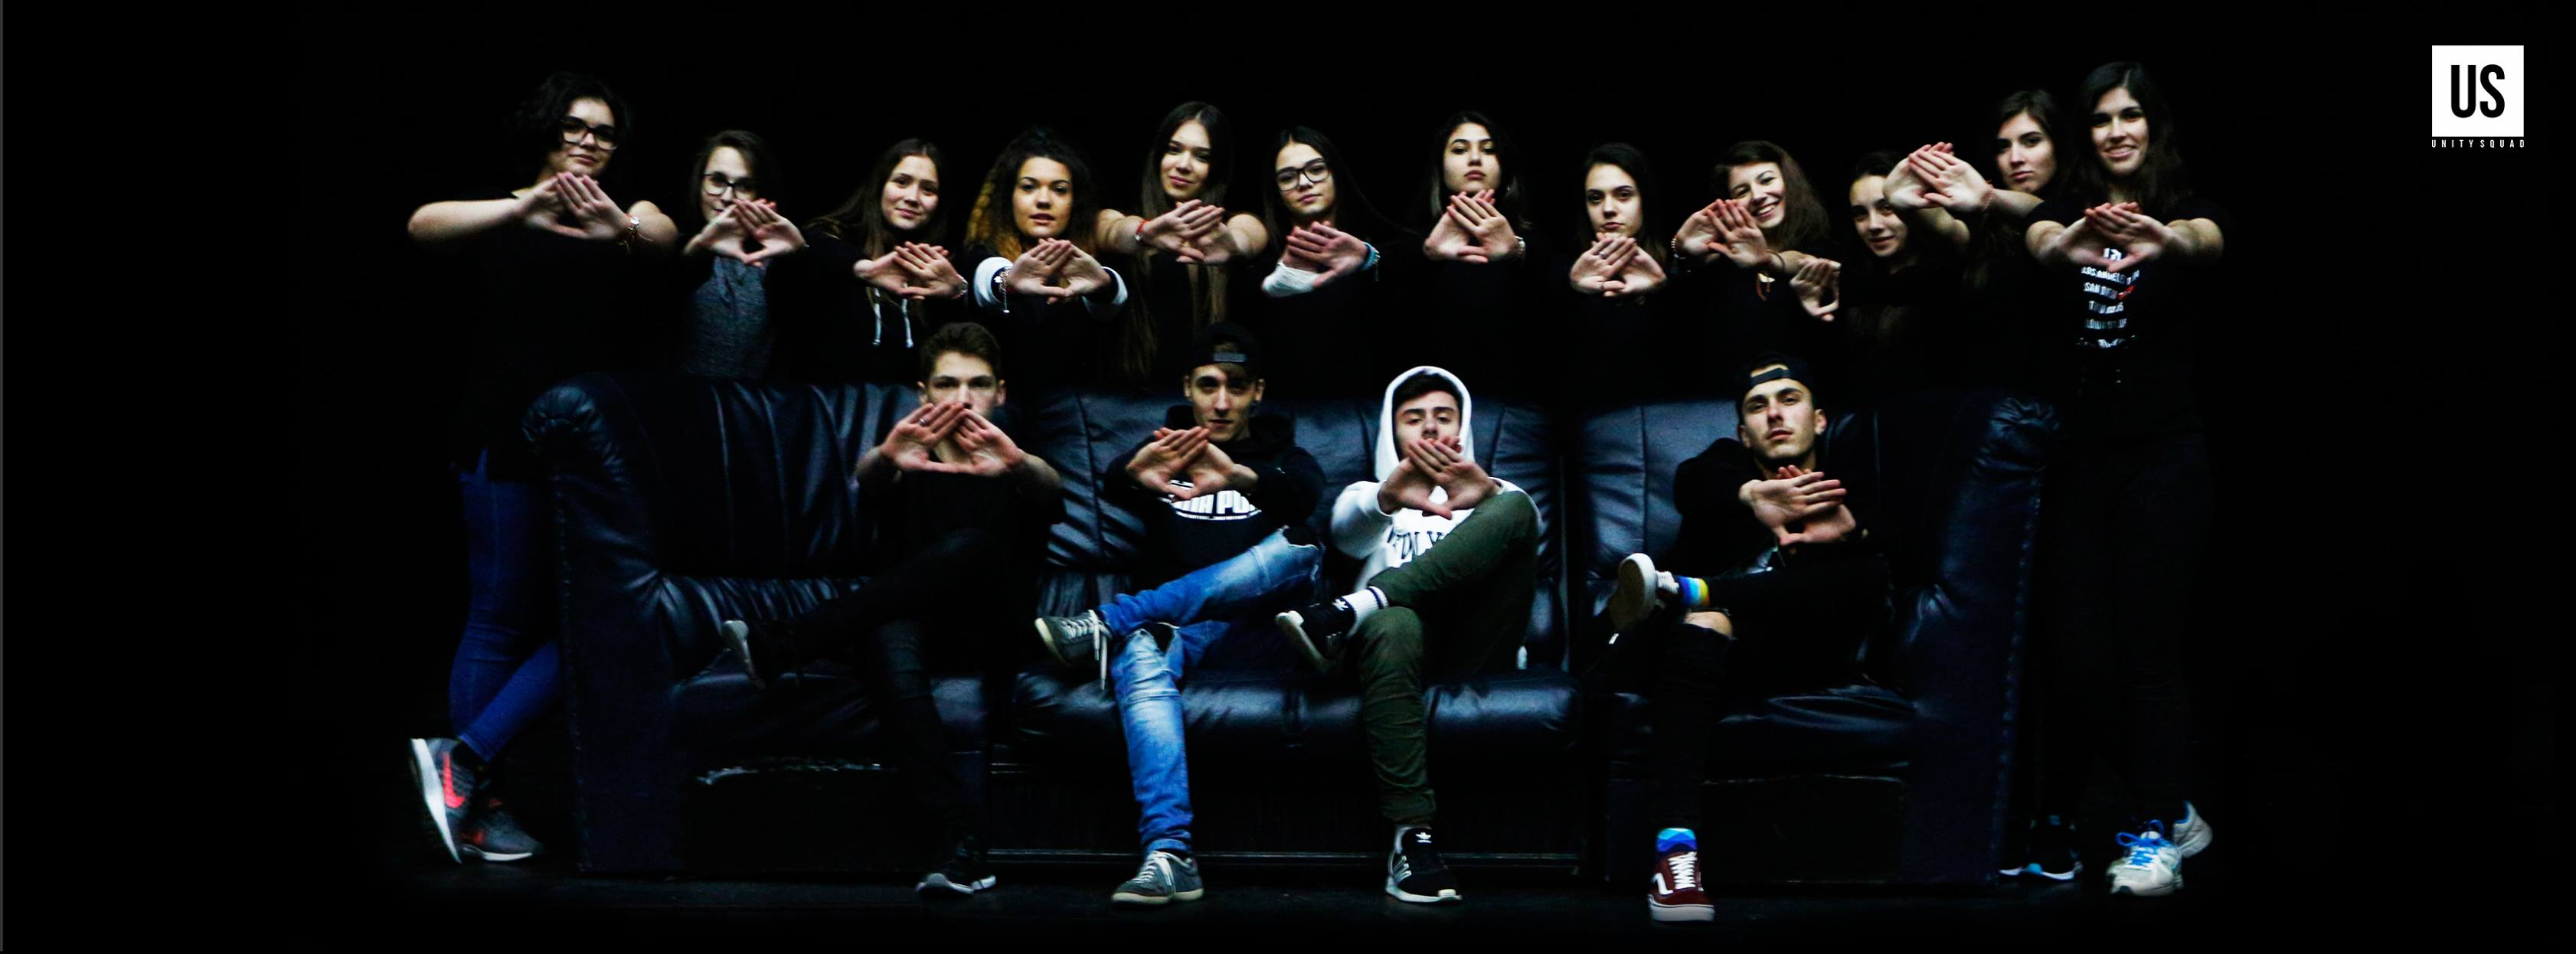 unity squad